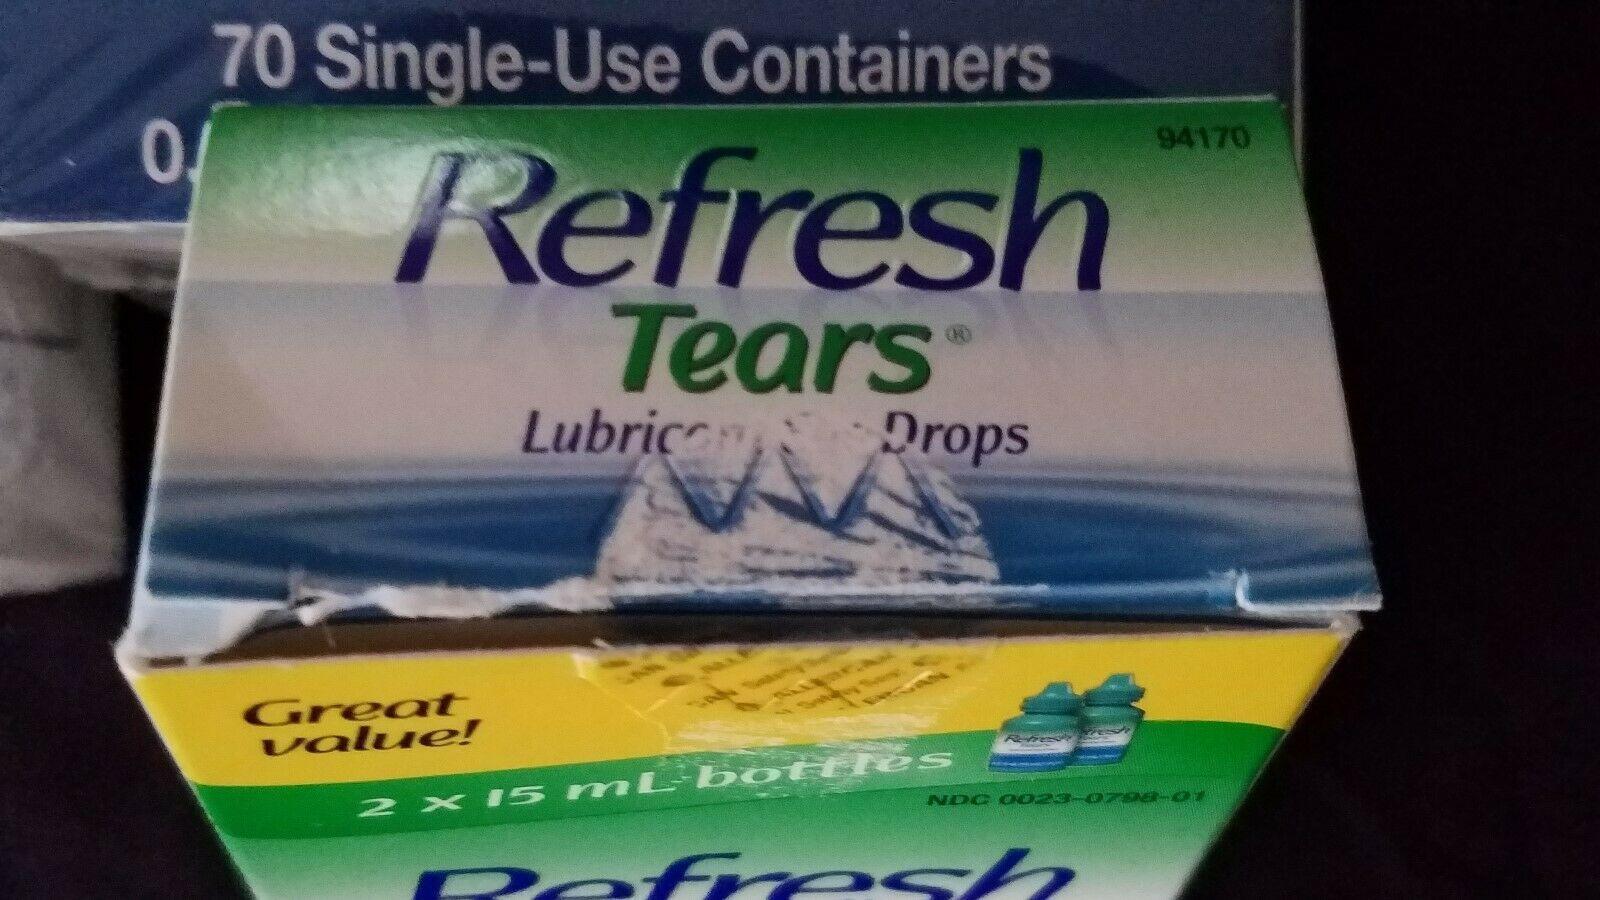 LOT of Refresh Plus Eye Drops 140 Vials+Refresh Tears Eye Drops 3 x 15ml Bottles